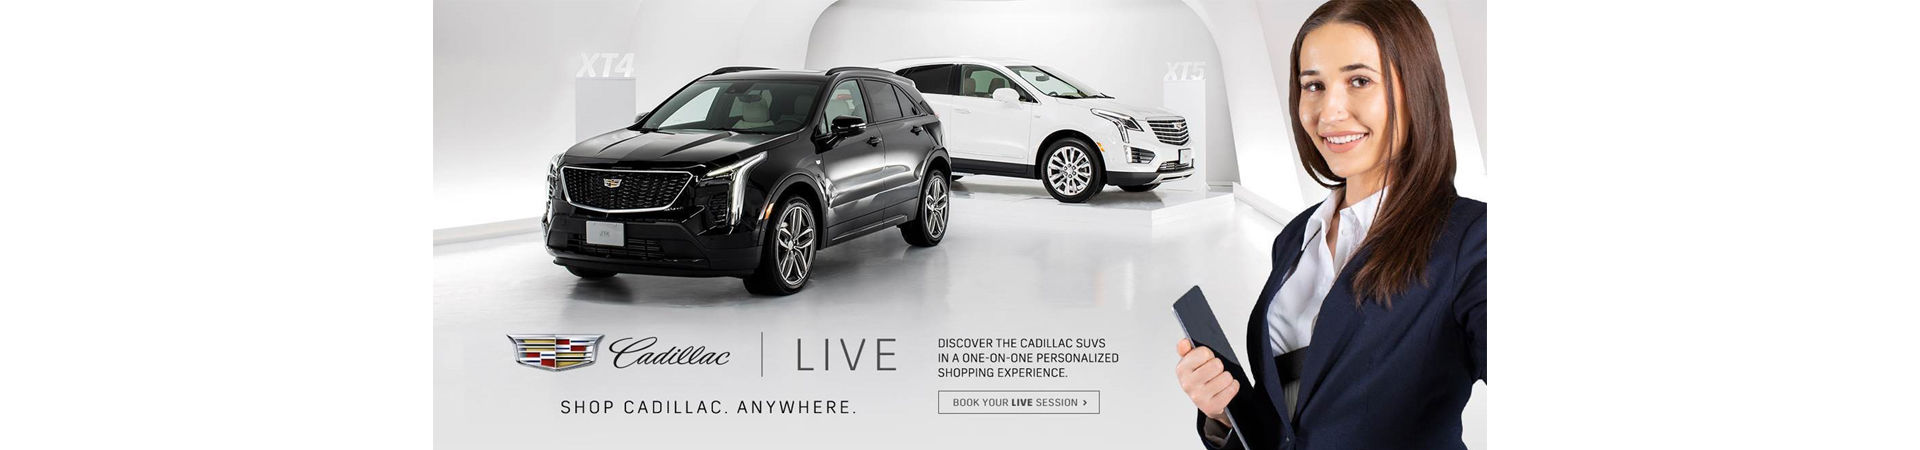 Cadillac Live